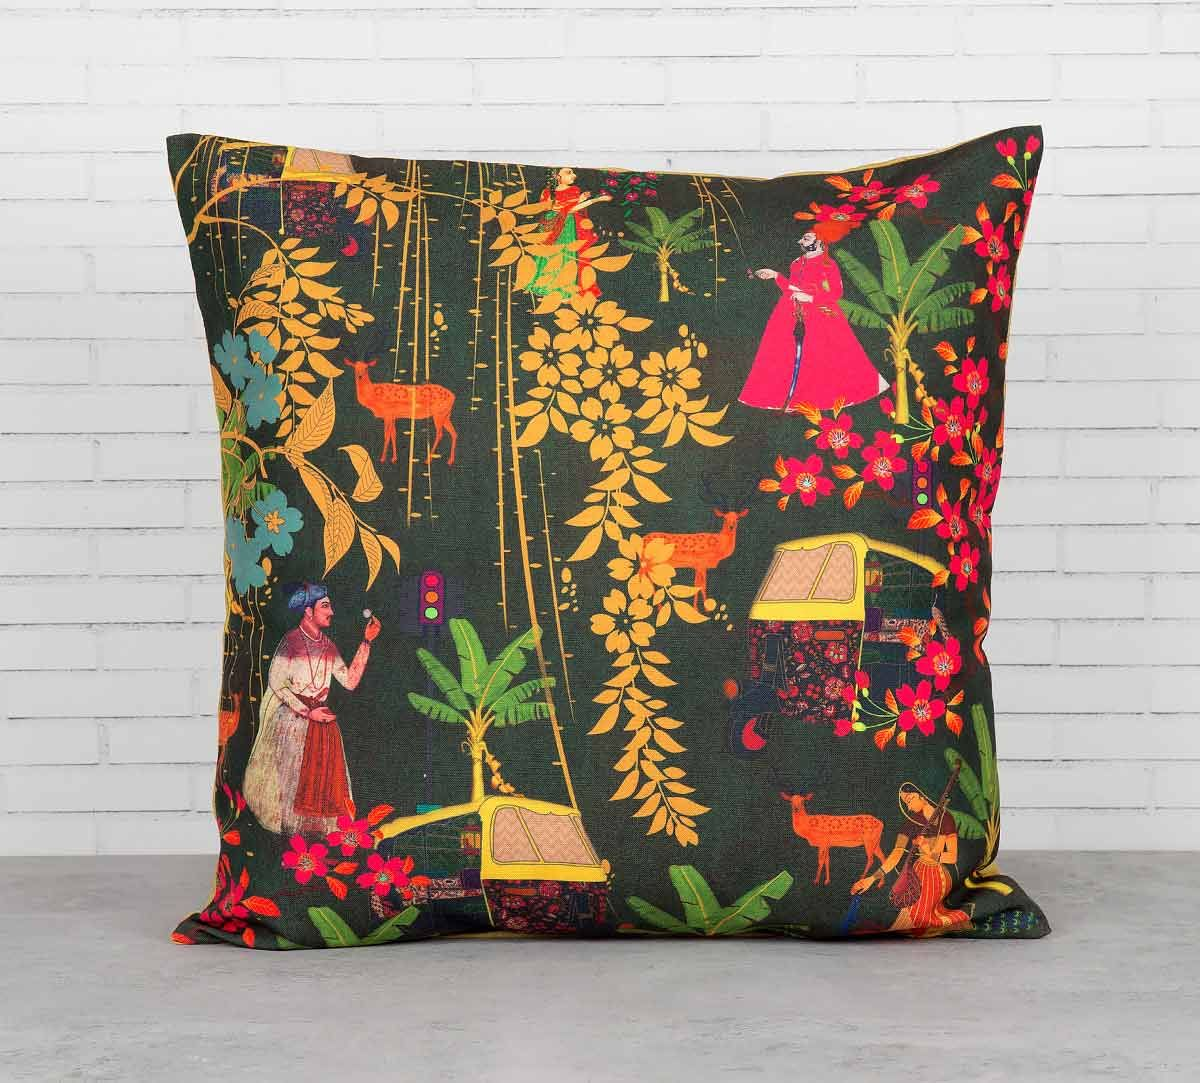 India Circus Mughal Traffic Cushion Cover